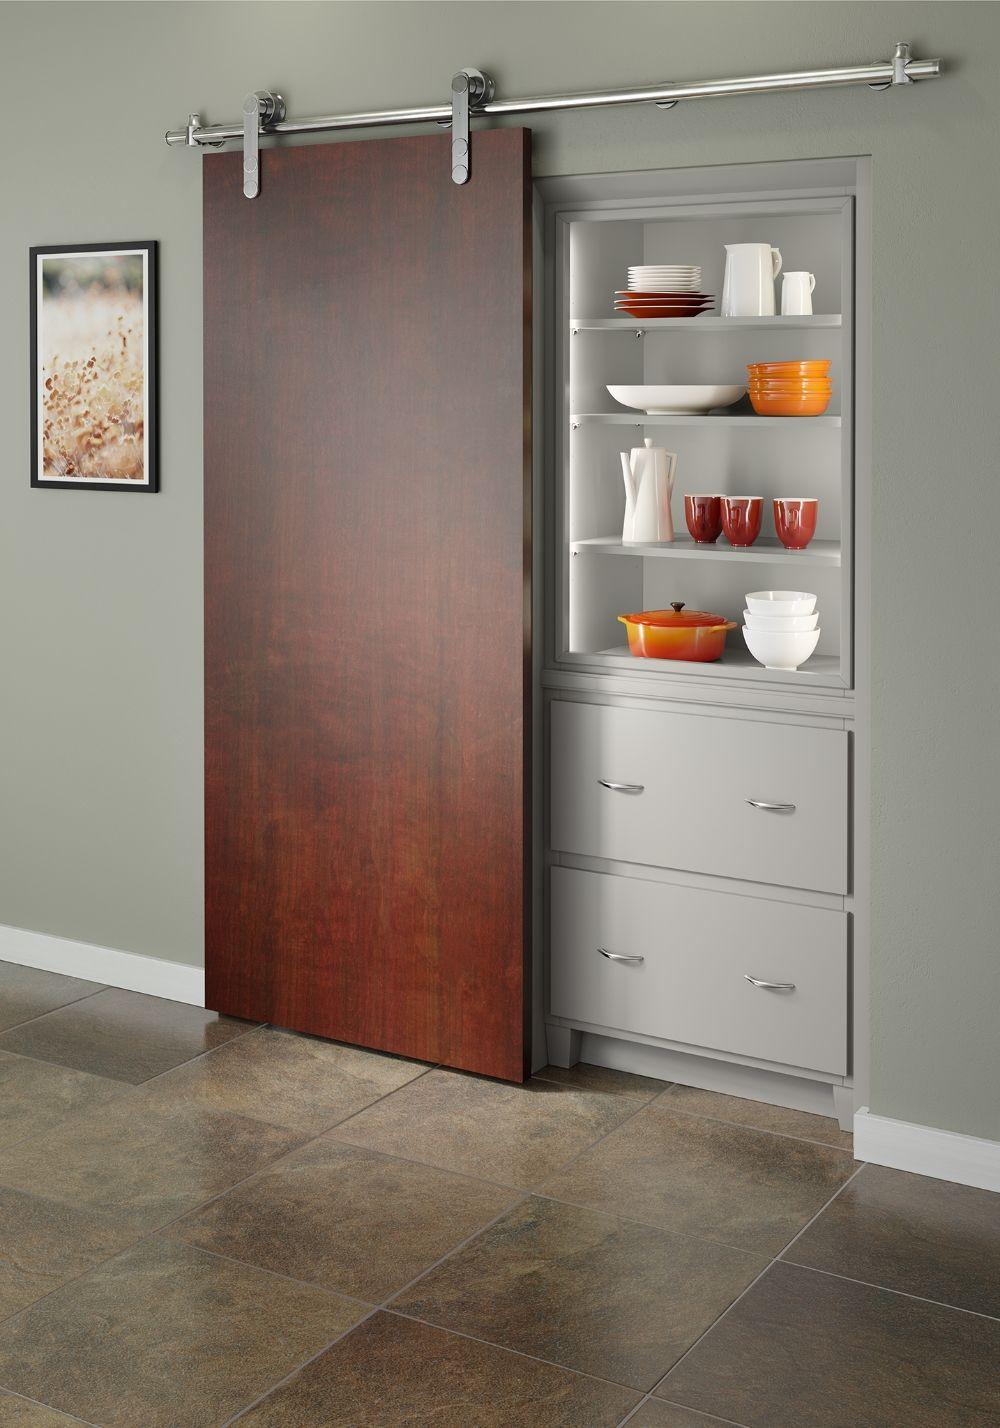 San Mateo Collection | American Woodmark in 2020 | Tall ...